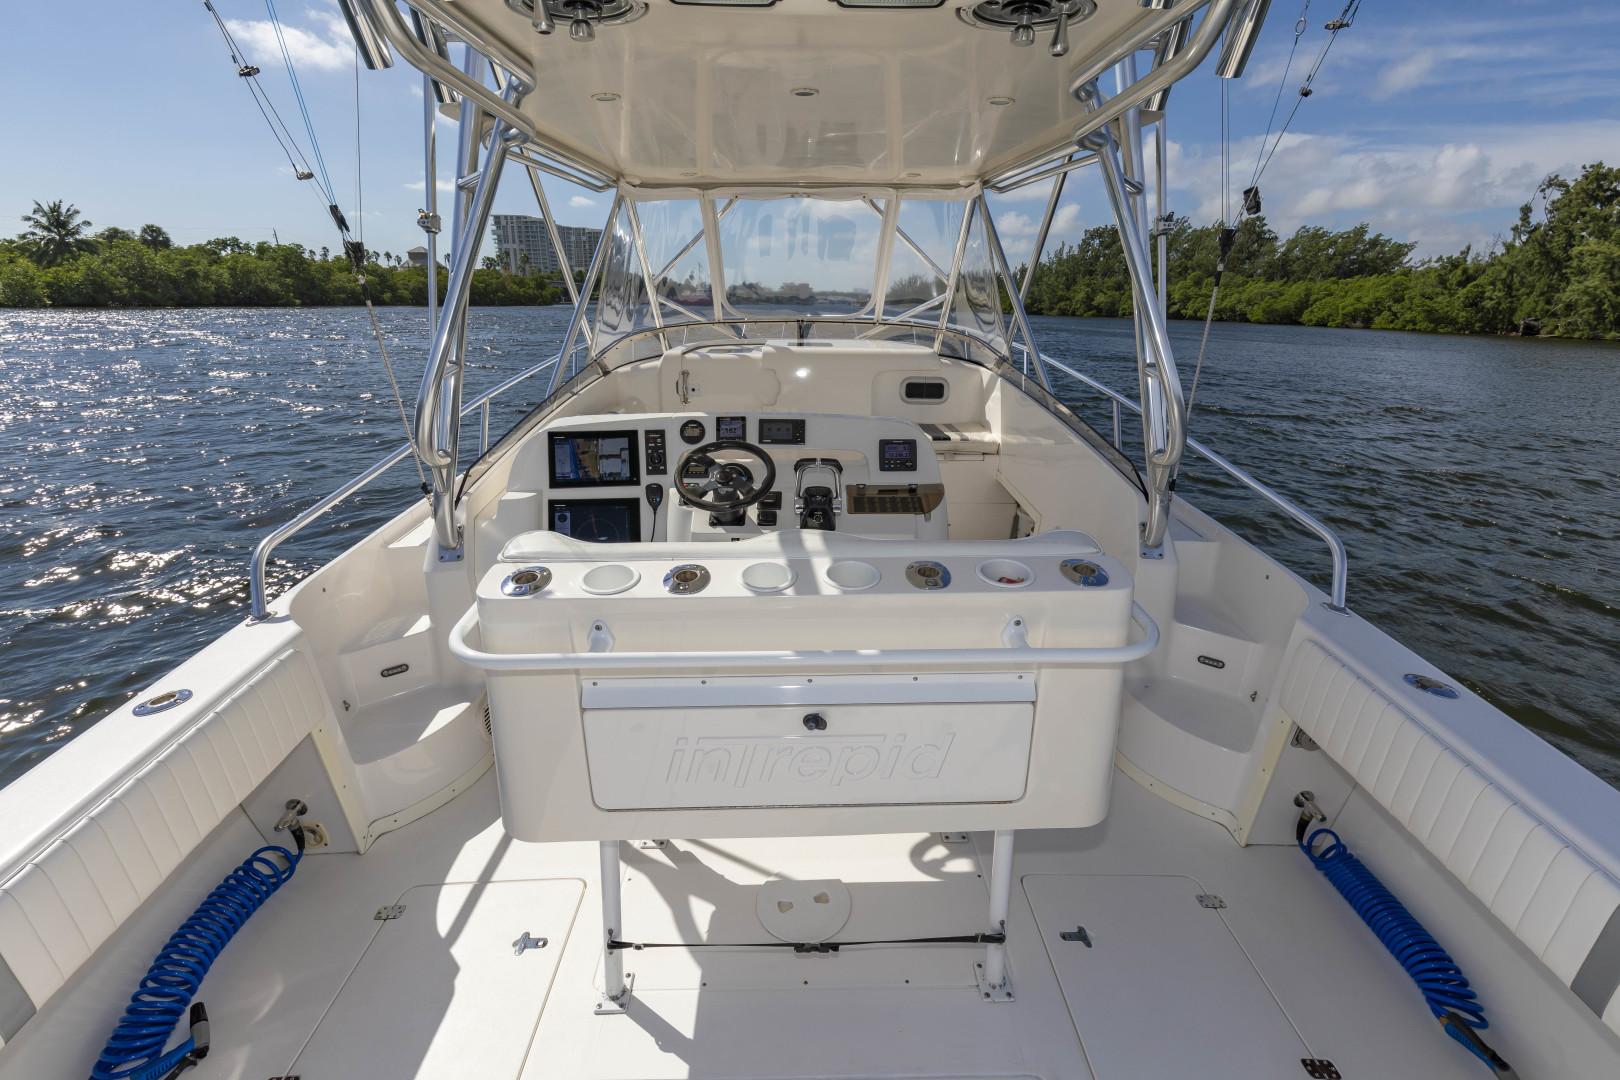 Intrepid-377 Walkaround 2005-Rock Boat REFIT 2018 Dania Beach-Florida-United States-377 Intrepid Helm 10-1511550 | Thumbnail